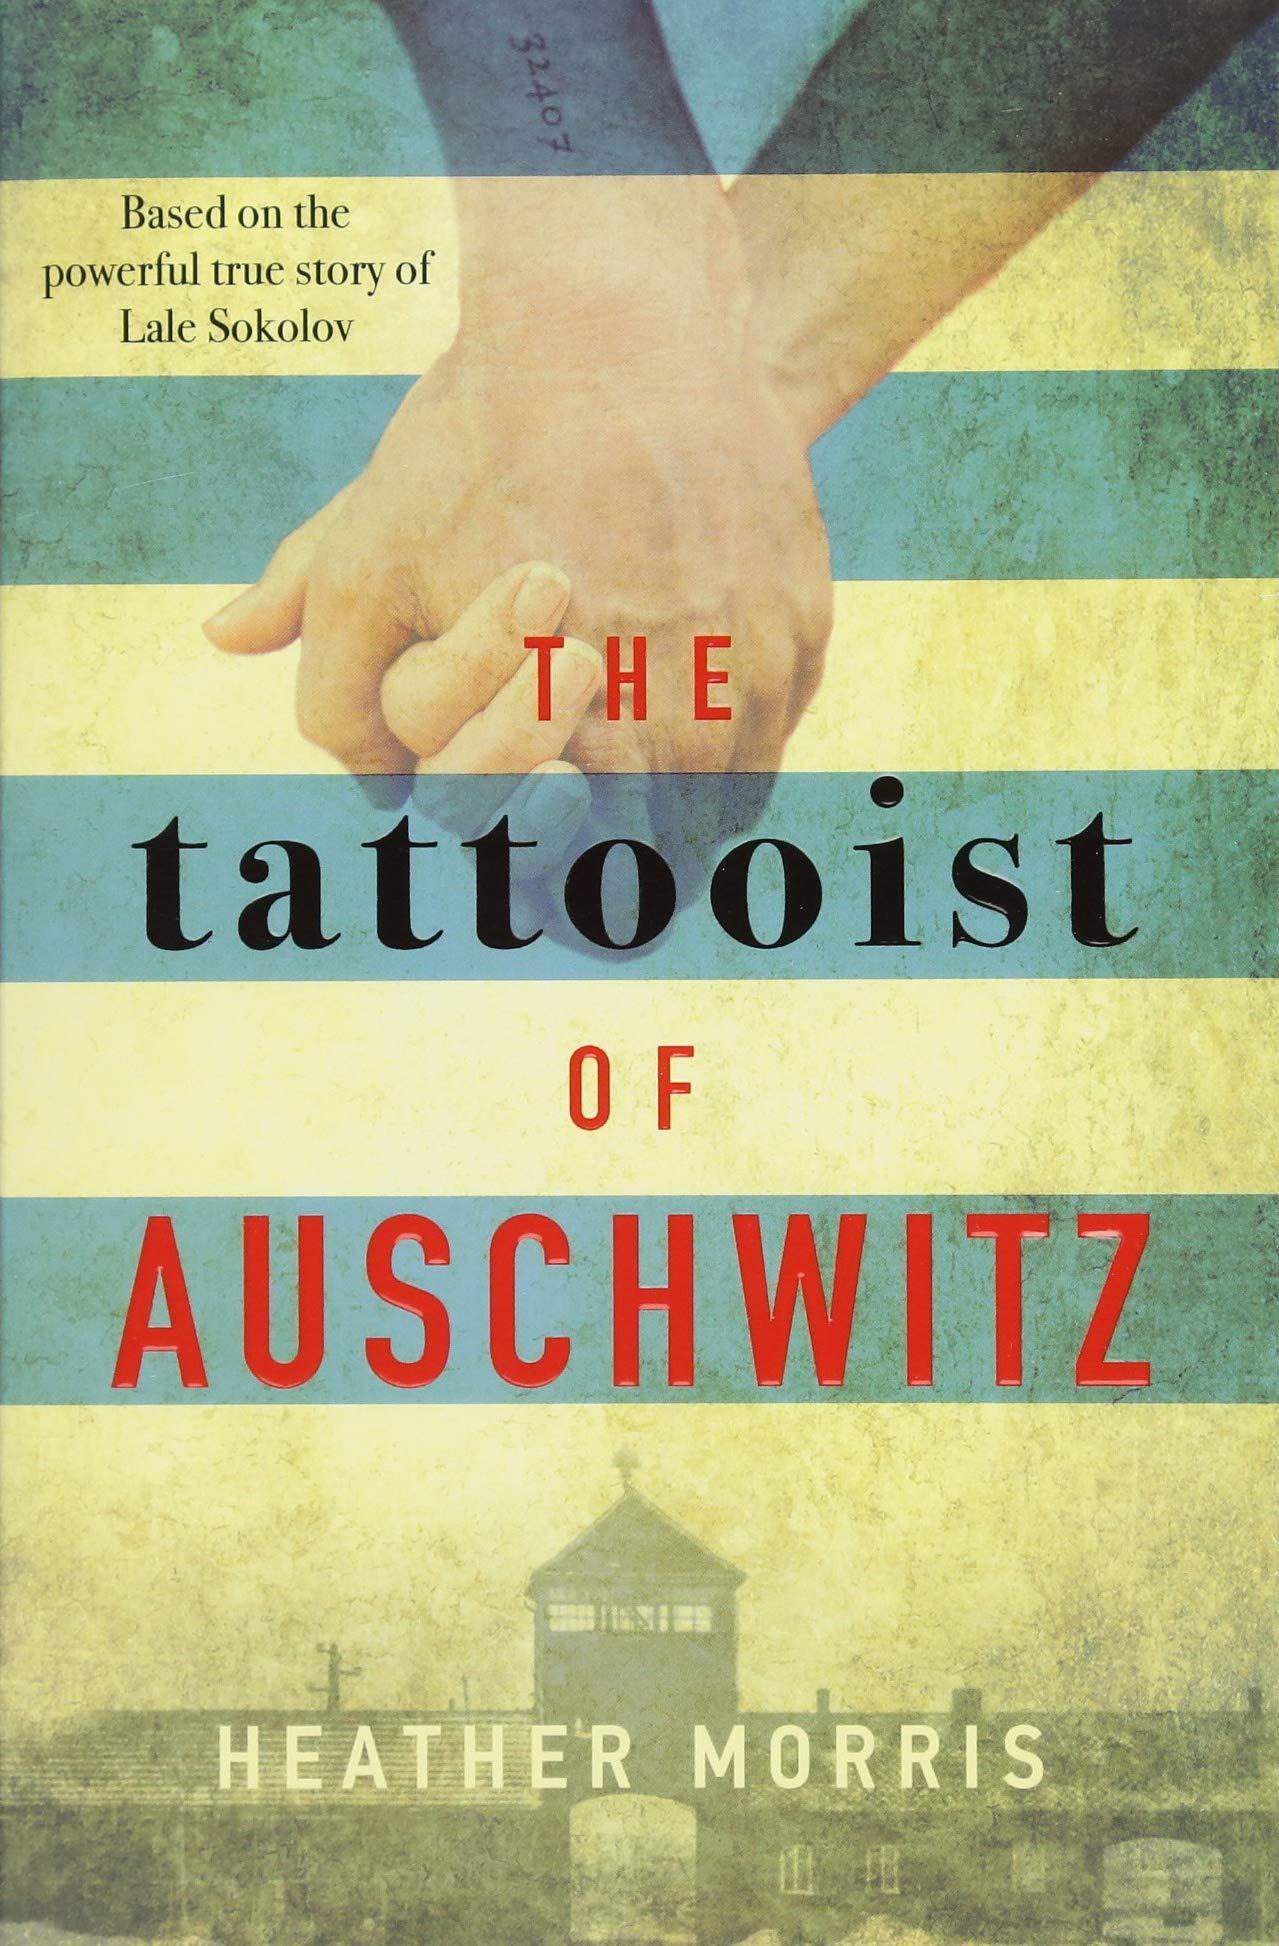 The Tattooist Of Auschwitz: Amazon.es: Morris Heather, Morris ...